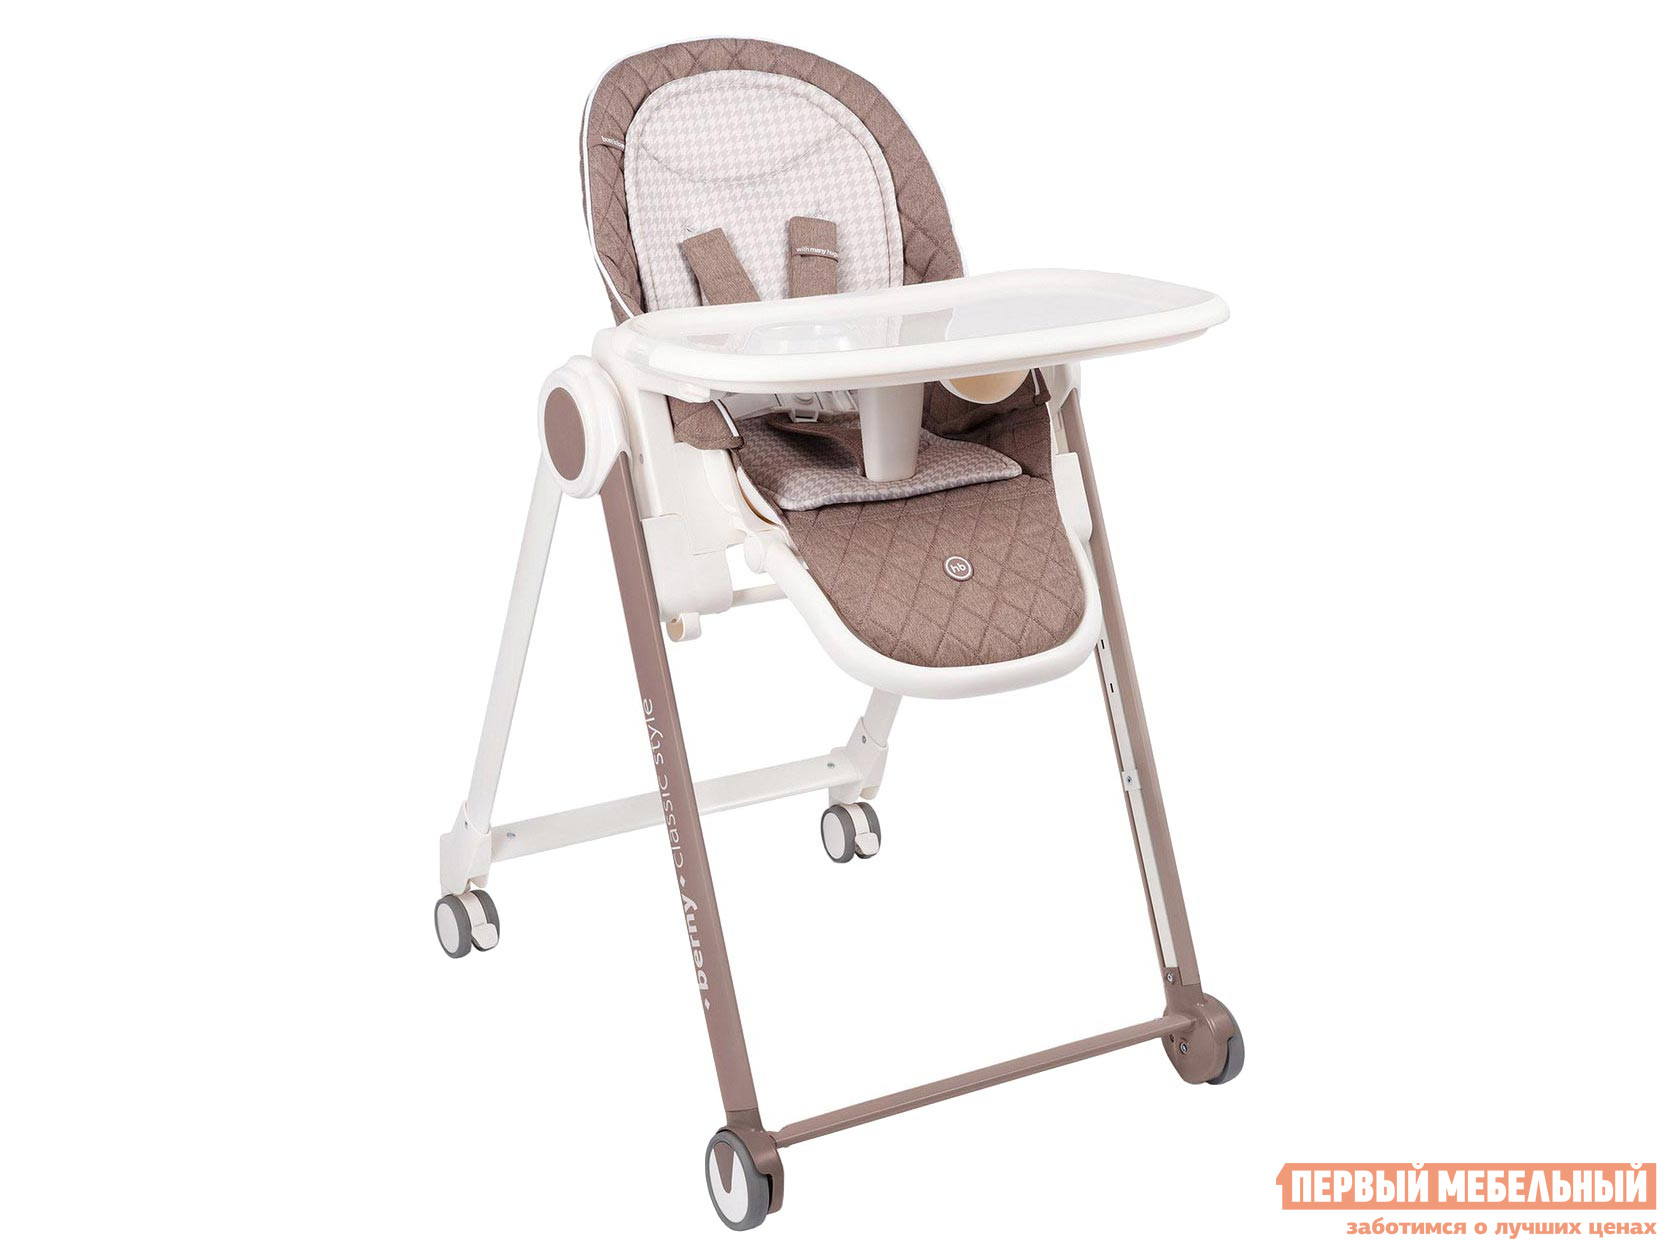 Стульчик для кормления Опт-Юнион Стул для кормления BERNY BASIC стул для кормления happy baby berny basic beige